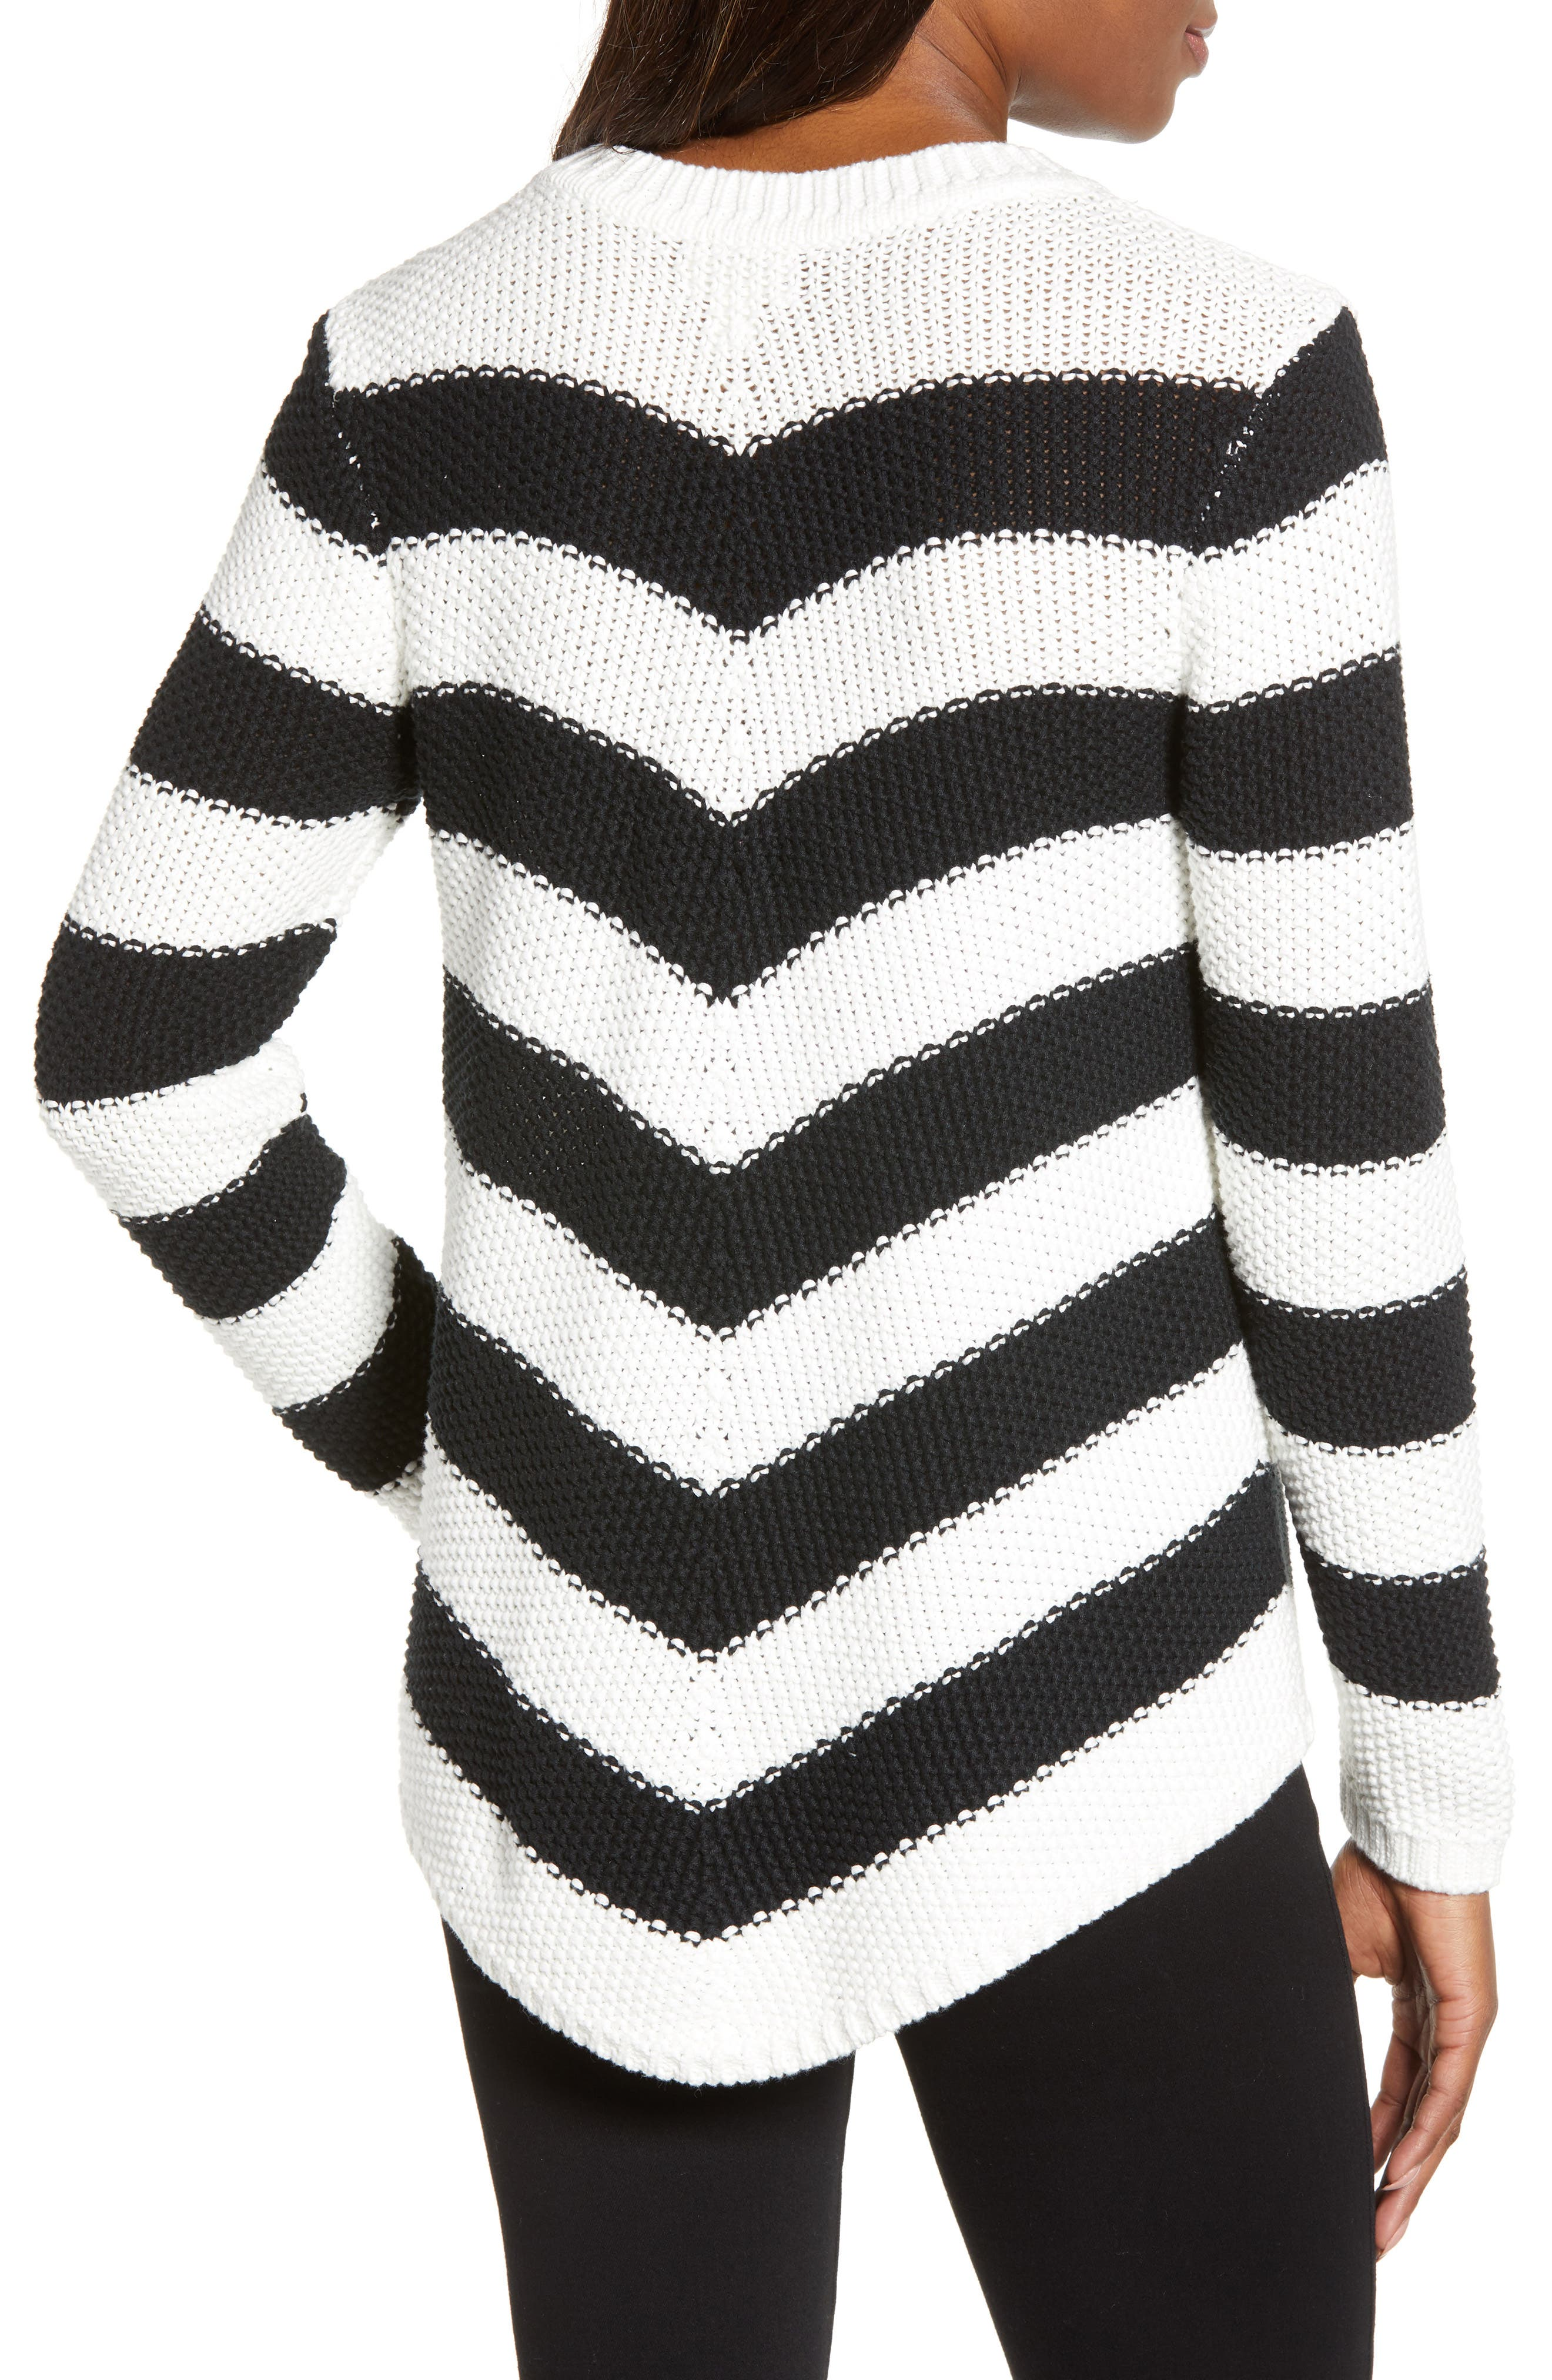 Stitch Stripe Sweater,                             Alternate thumbnail 2, color,                             BLACK- IVORY GABRIELLA STRIPE